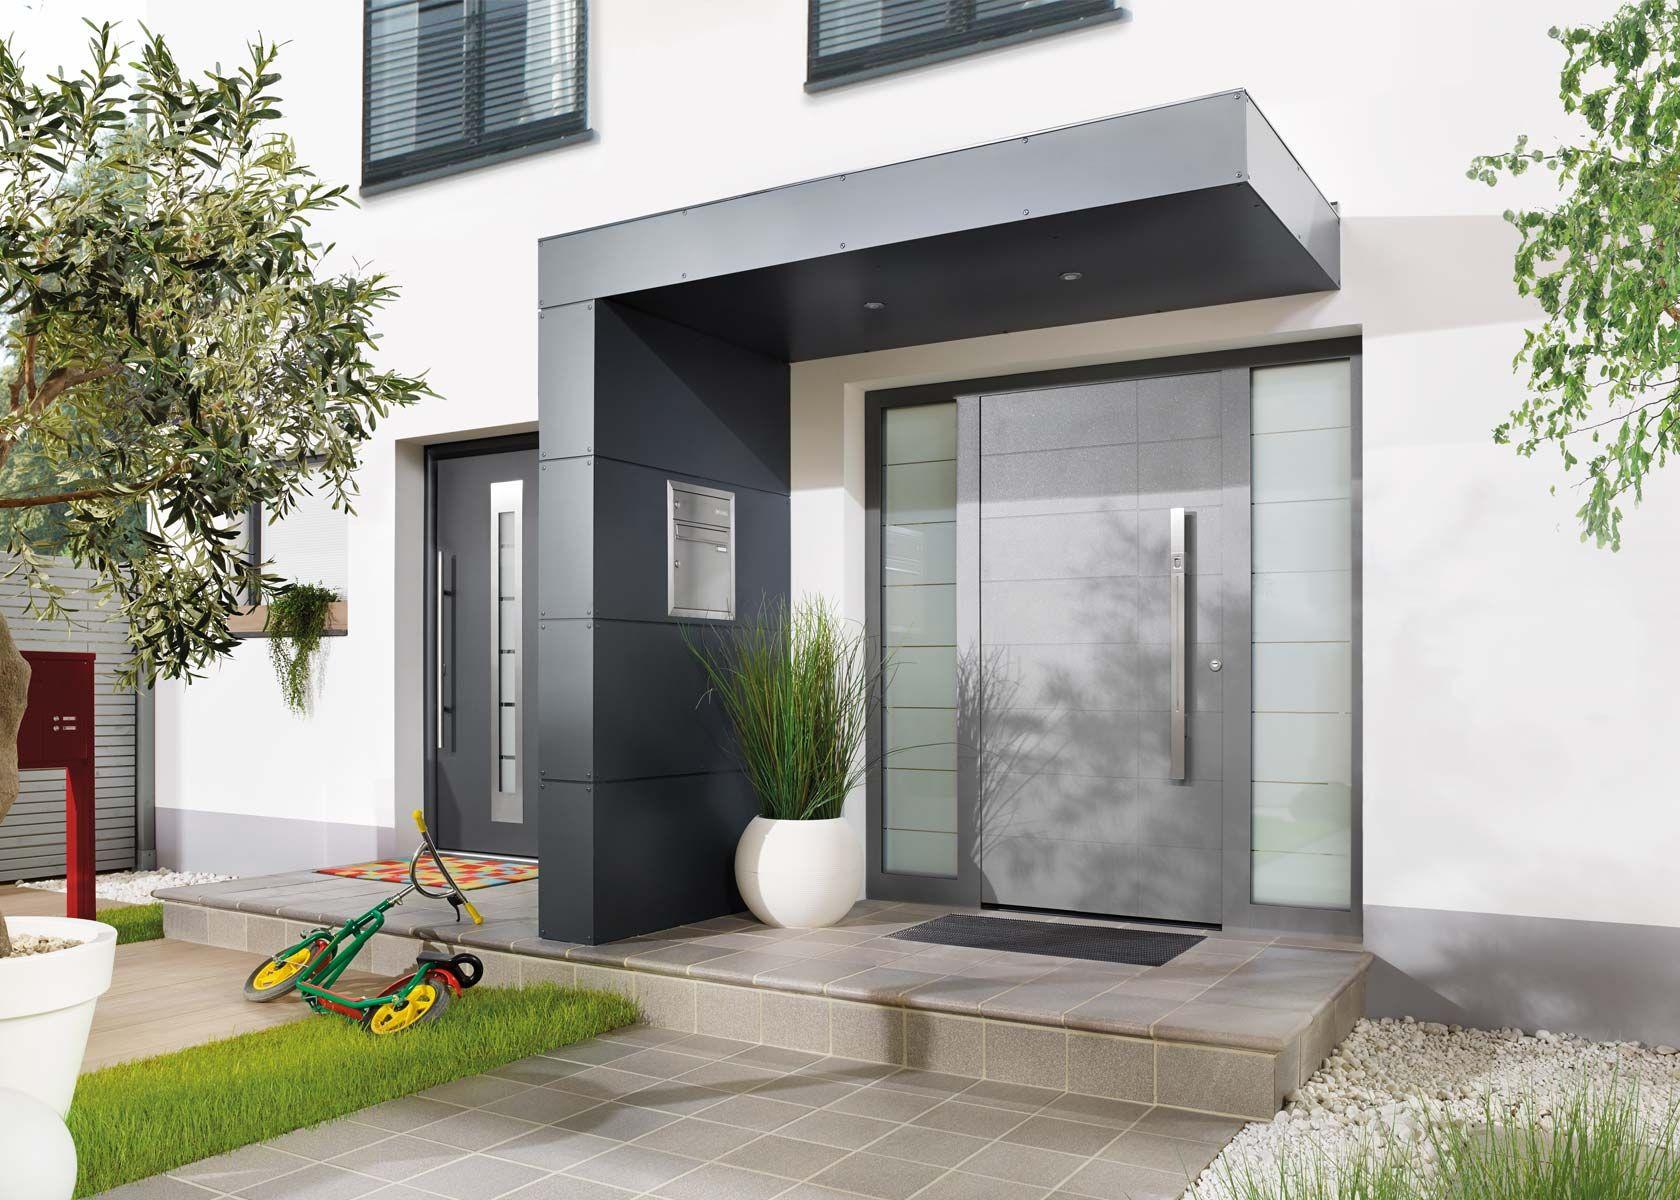 Eingangsuberdachung In L Form Verkleidet Mit Trespa Fassadenplatten